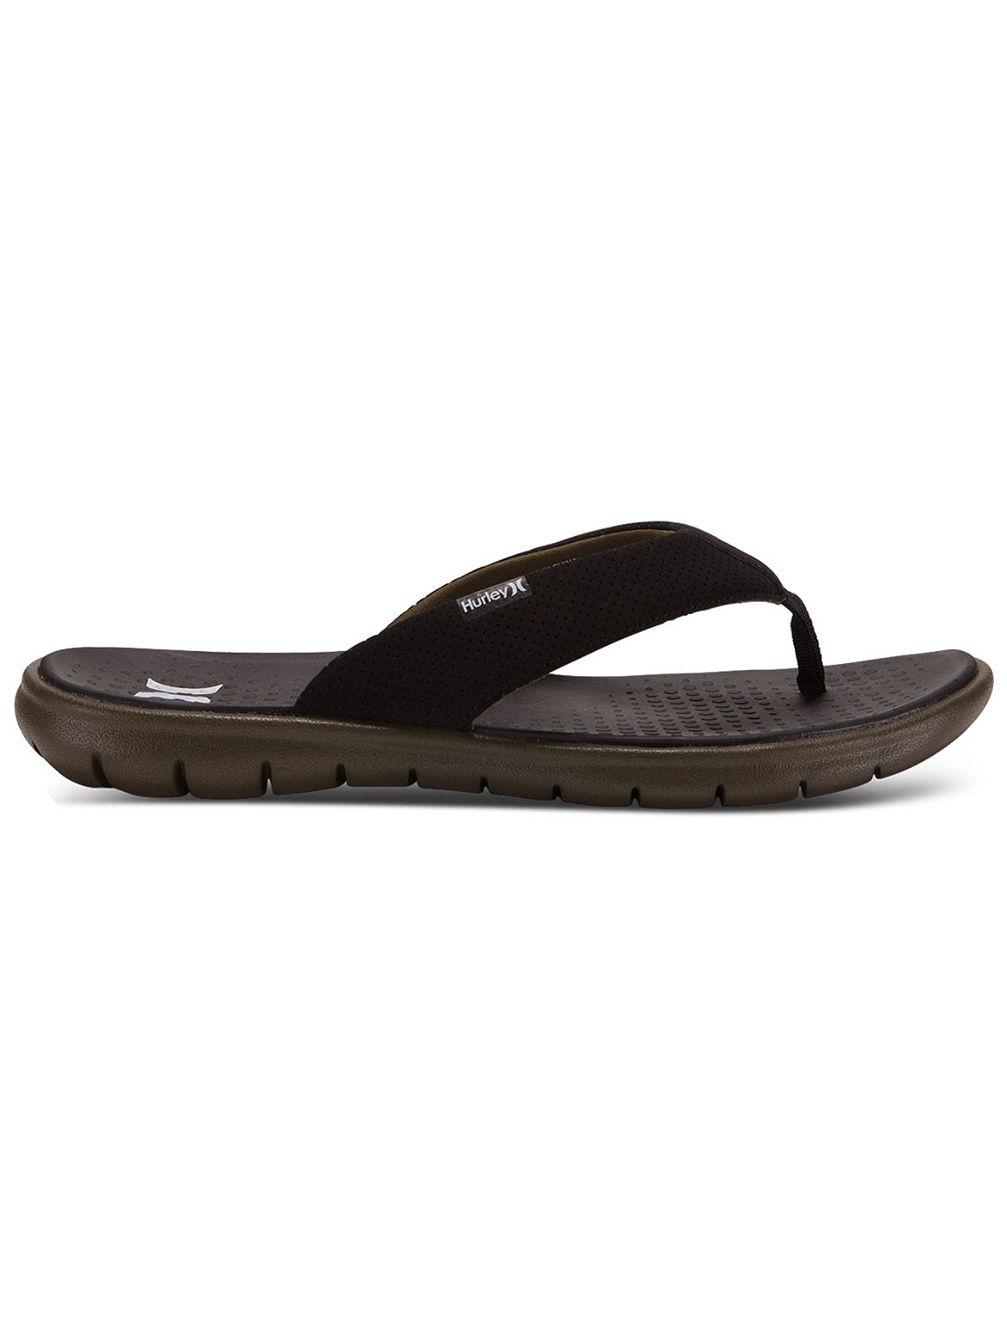 e3e448a4246 Buy Hurley Flex 2.0 Sandals online at blue-tomato.com